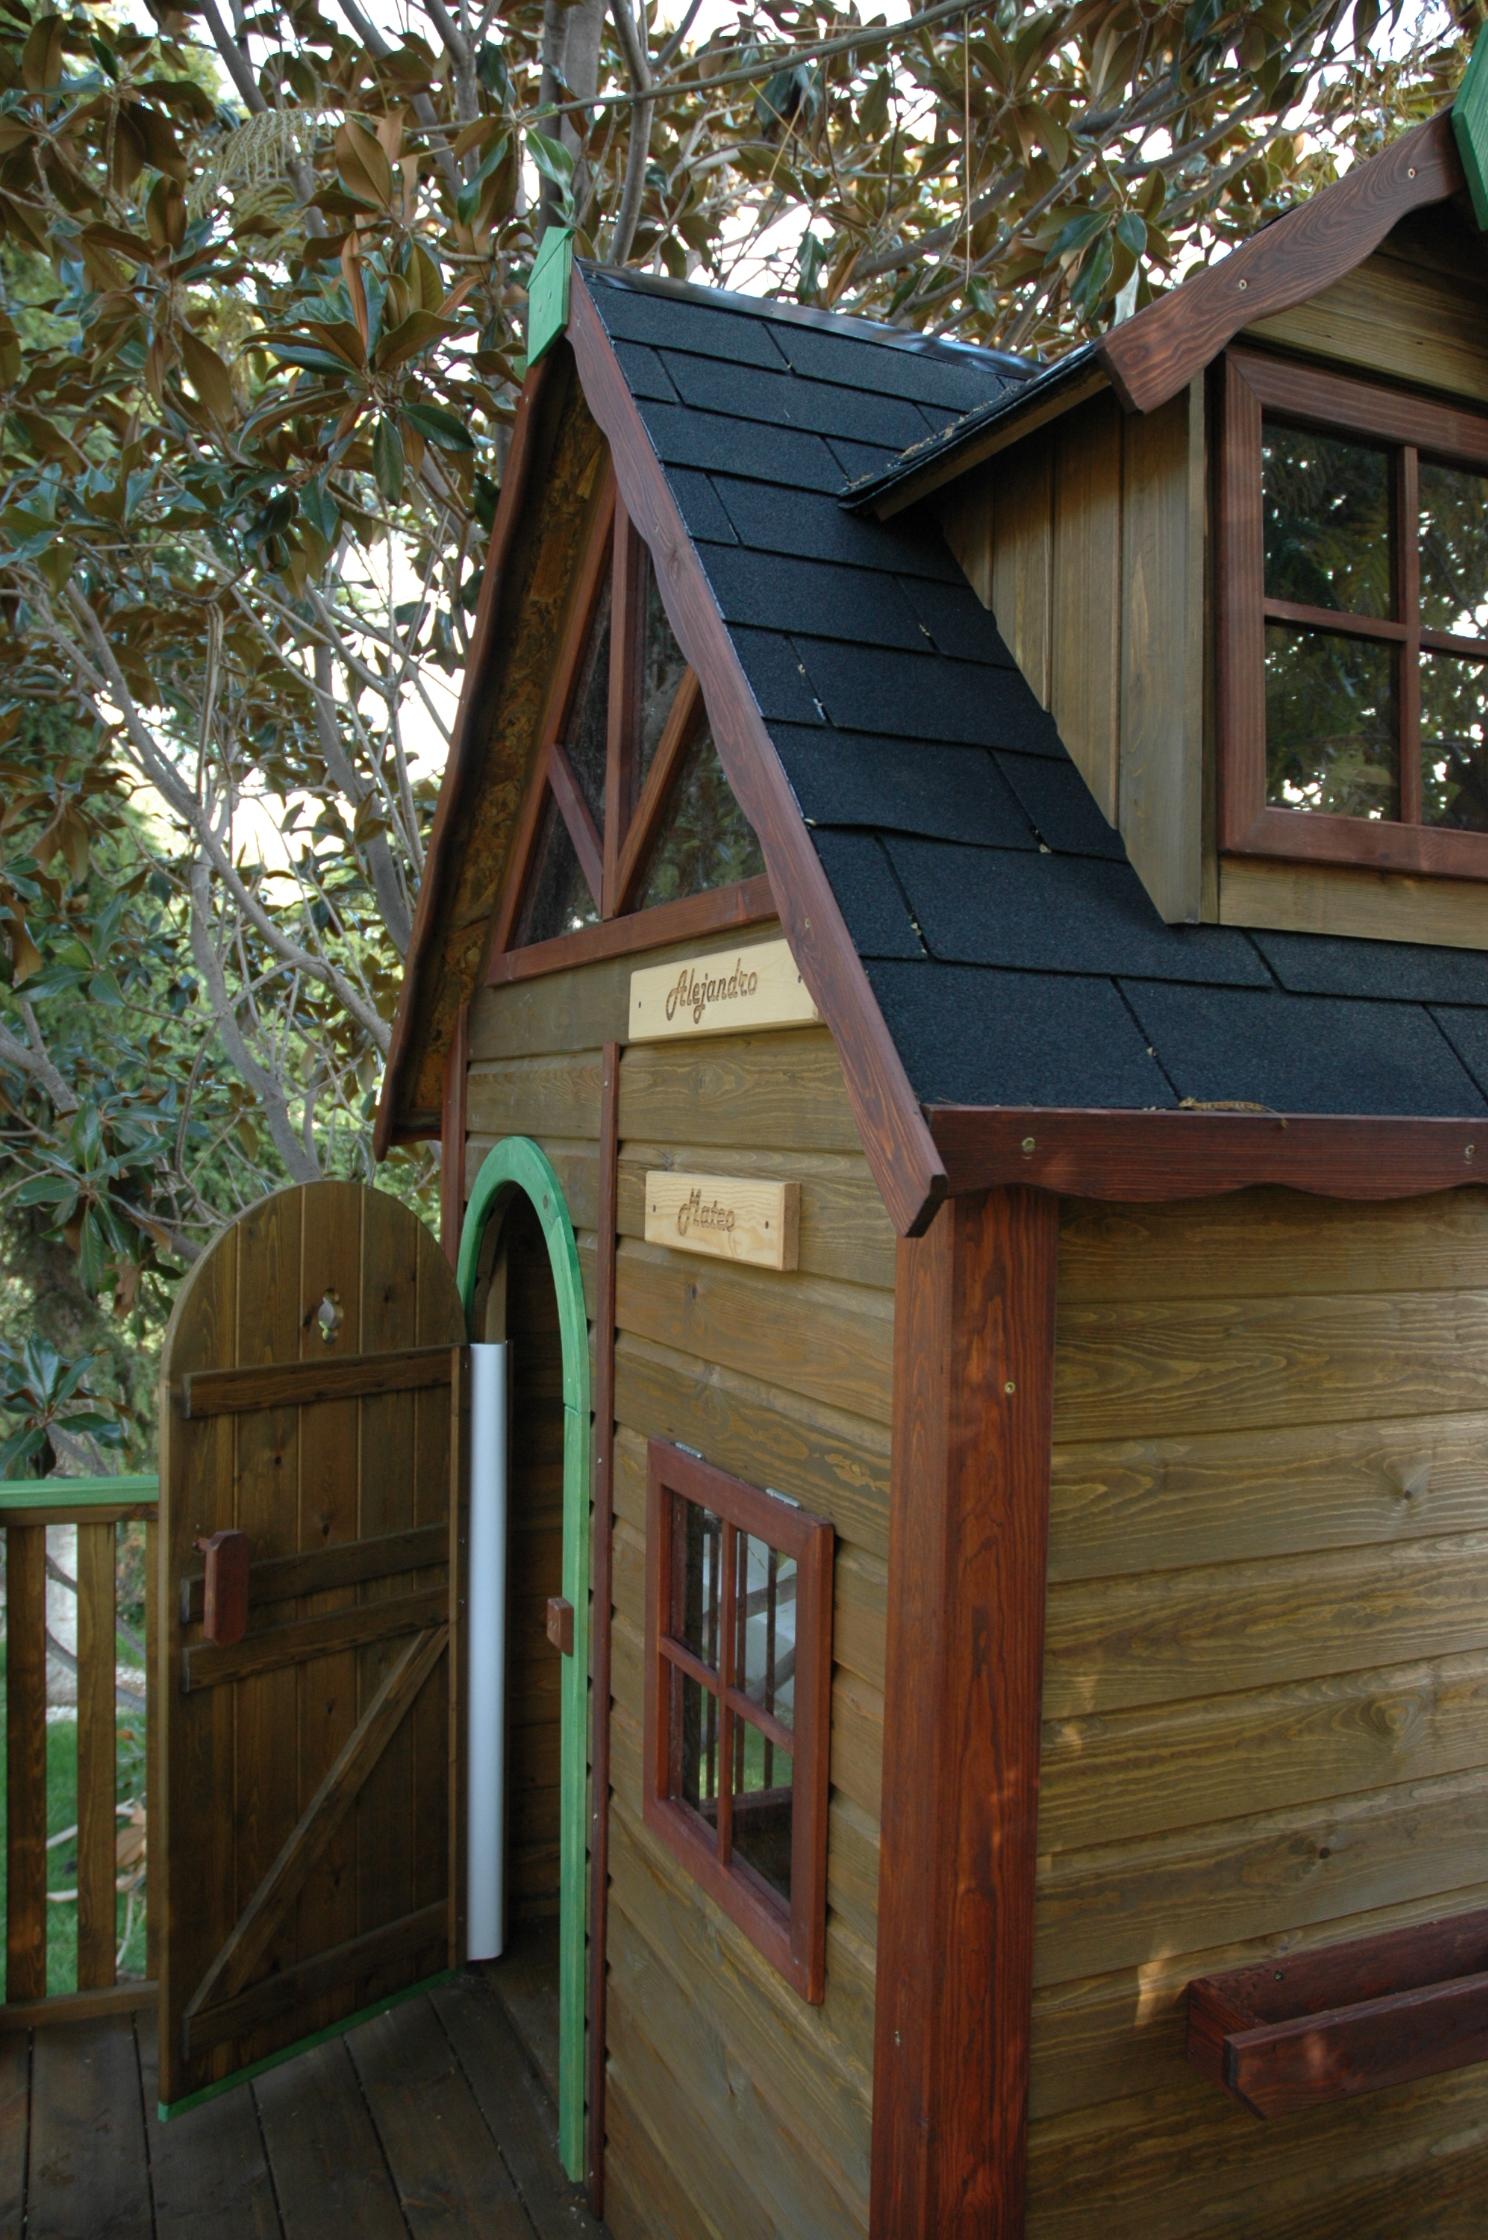 Casita de madera para ni os elevada mod kid estrucmader for Casitas de madera para ninos